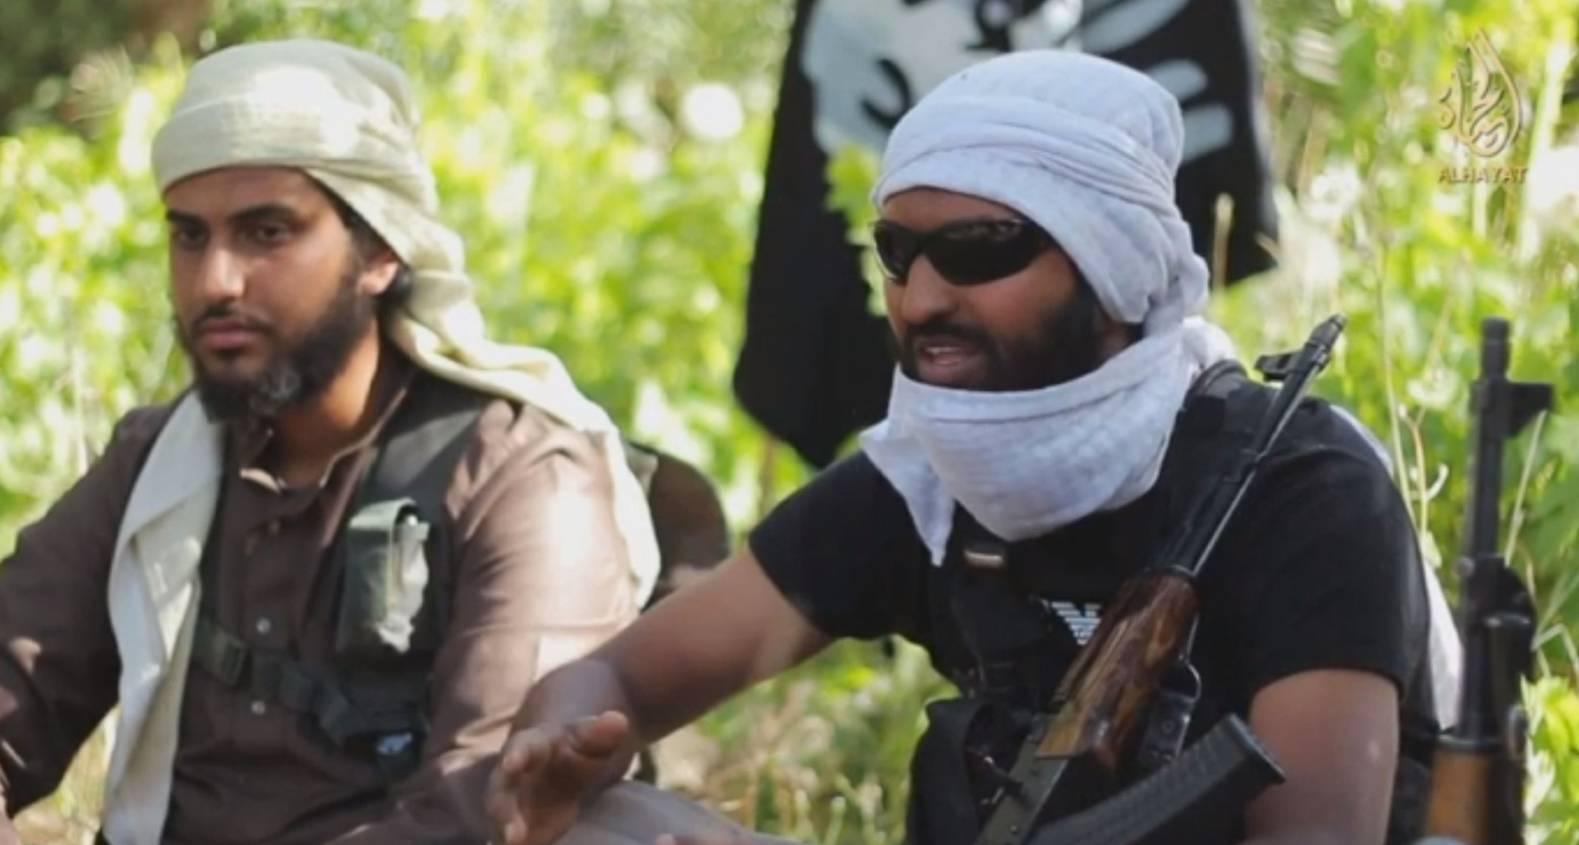 Ruhul, right, also known as Abdul Raqib Amin, was killed in by Syria by a RAF drone strike.